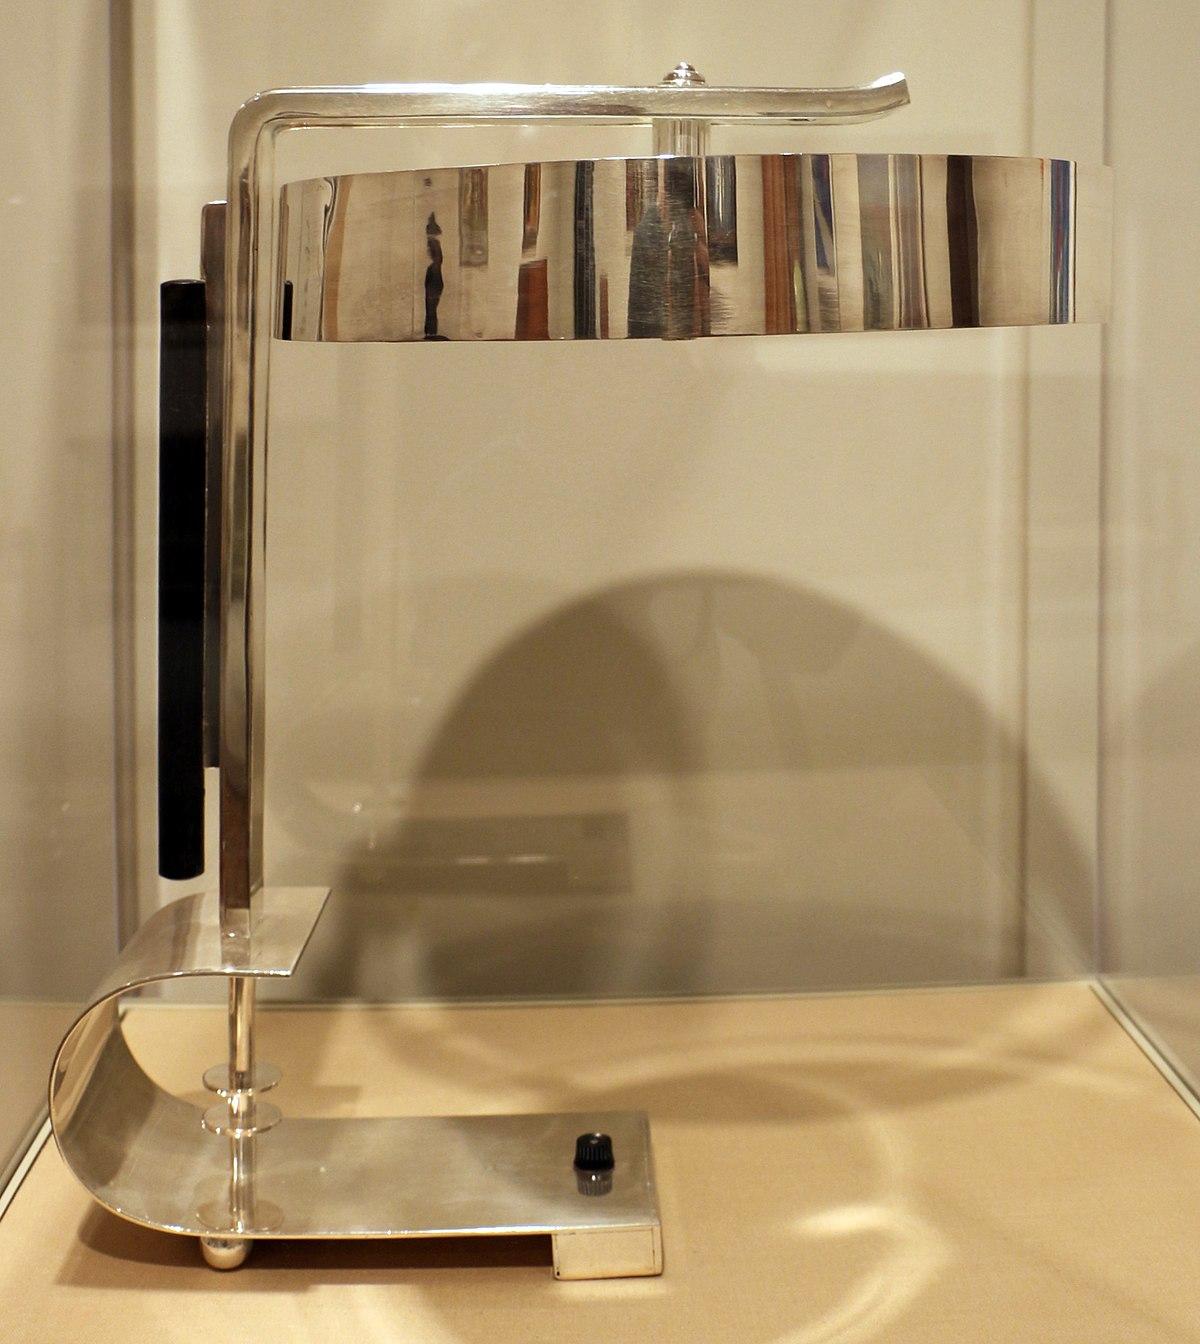 Lampada Da Studio Design file:walter von nessen per nessen studio, inc., lampada da